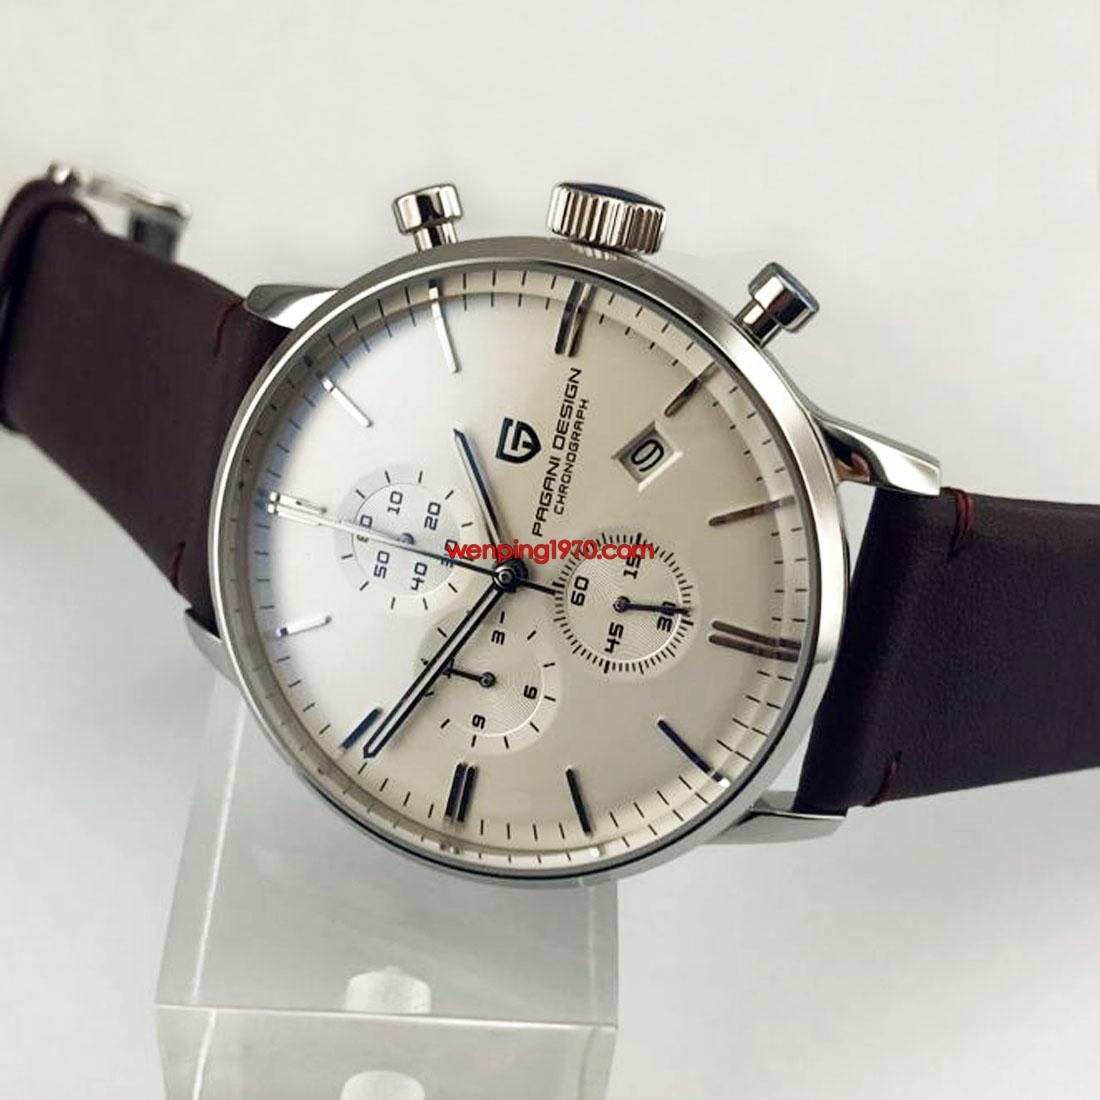 pagani design 43mm white dial chronograph japanese quartz men's